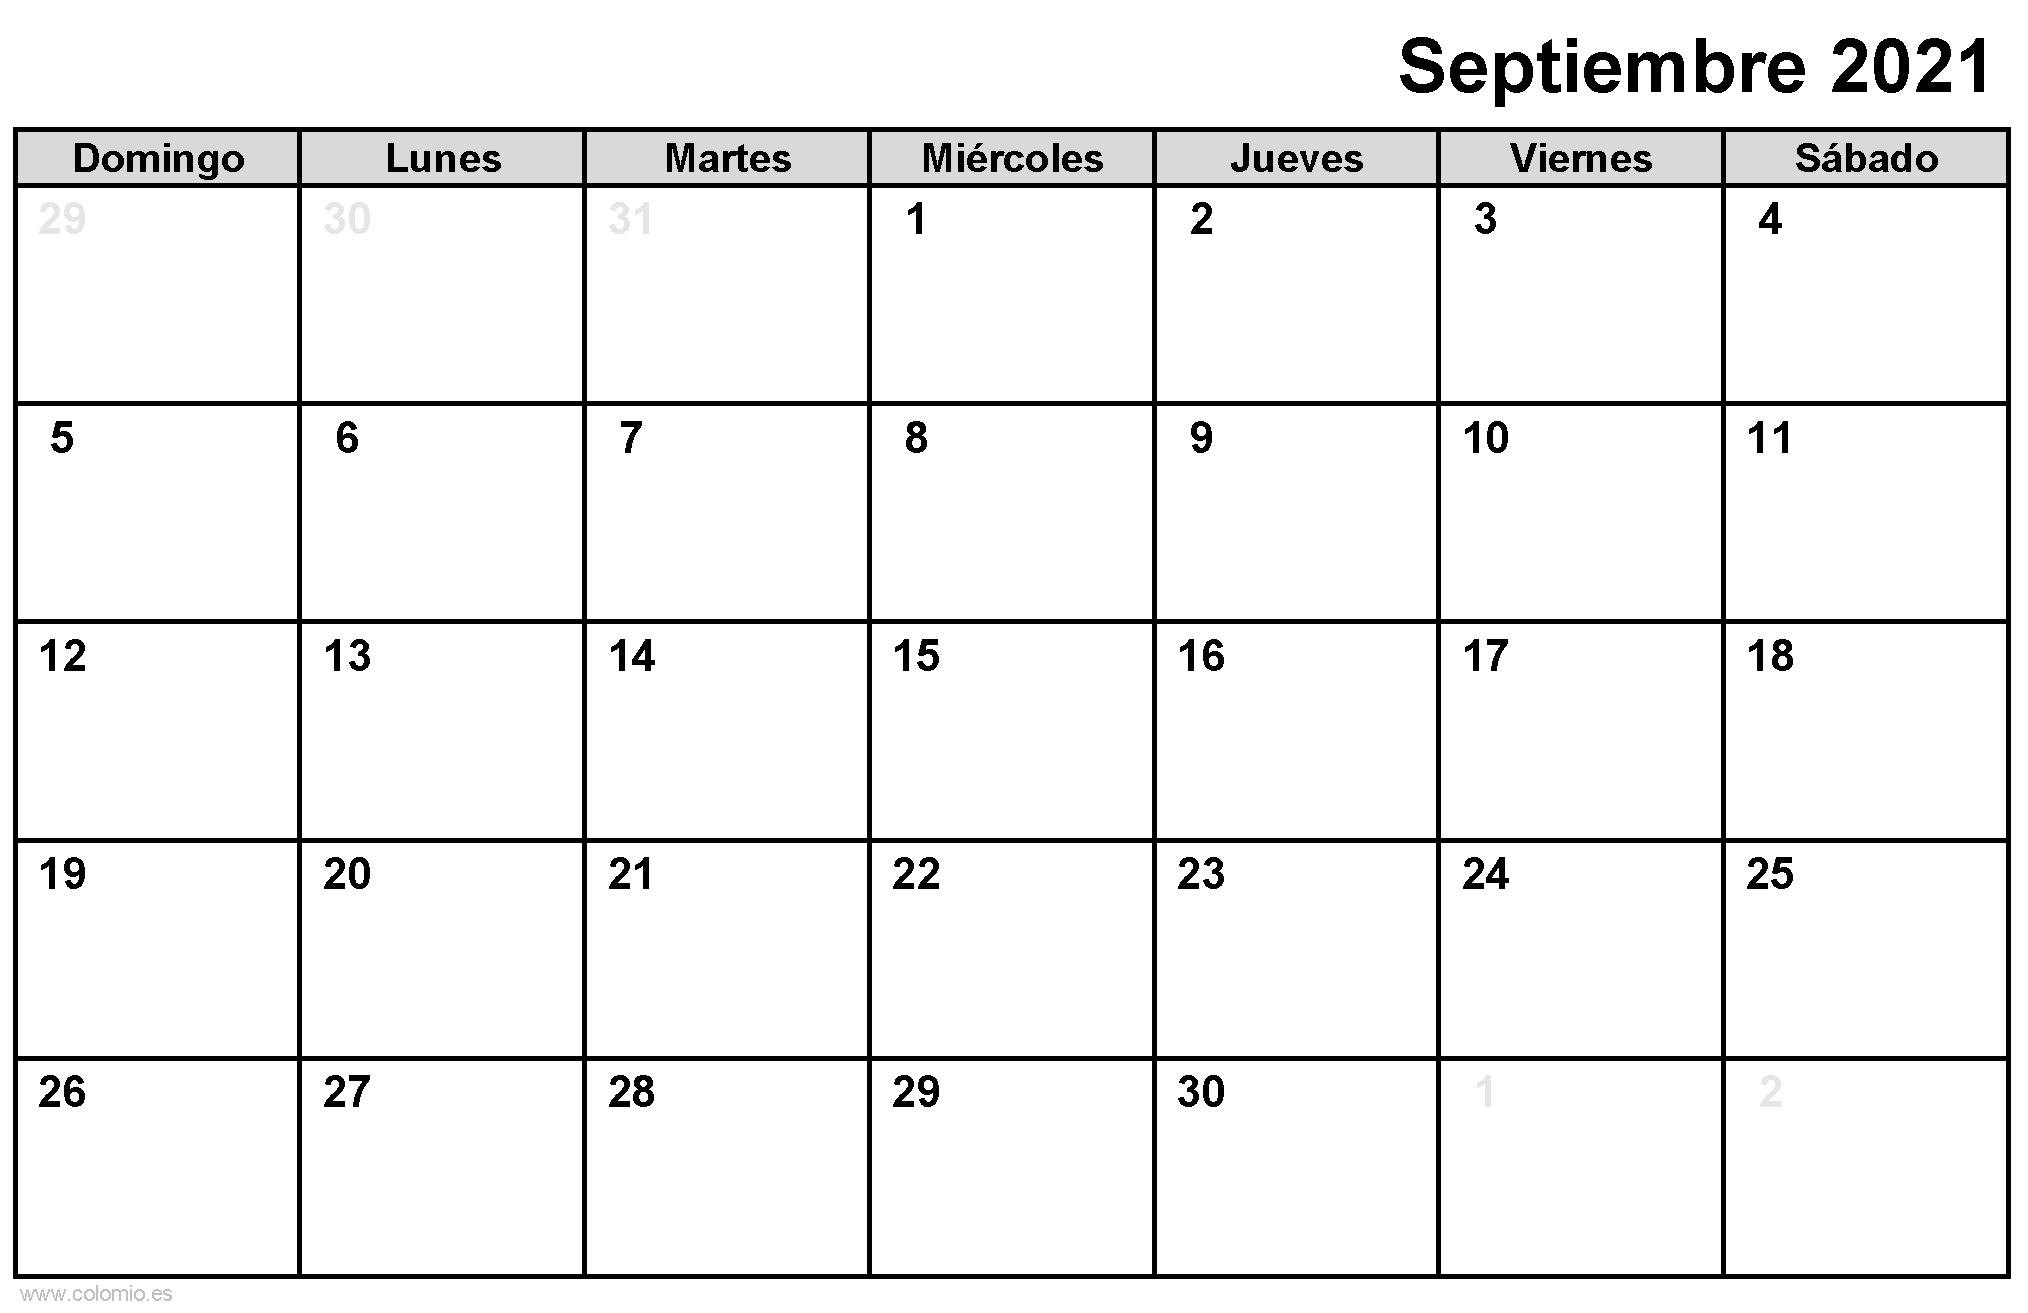 Calendario Septiembre 2021 para imprimir